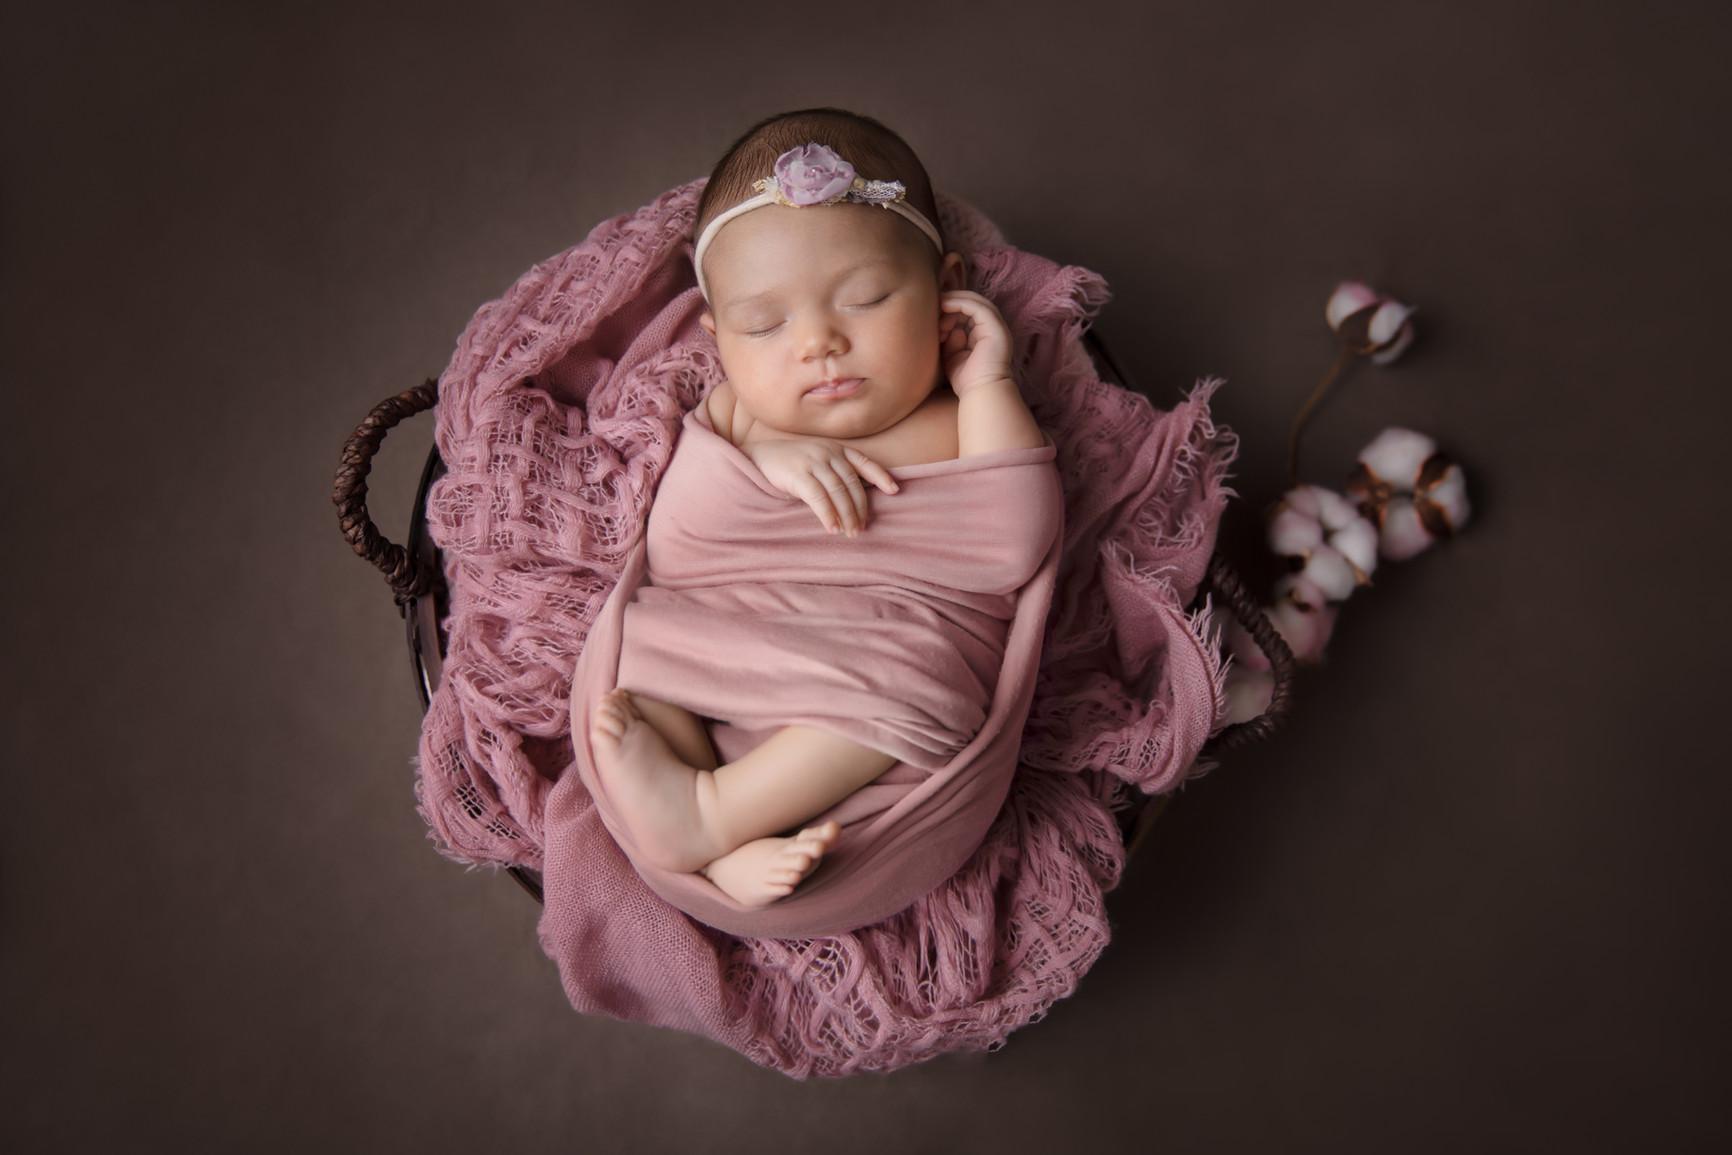 Newborn baby girl in a basket